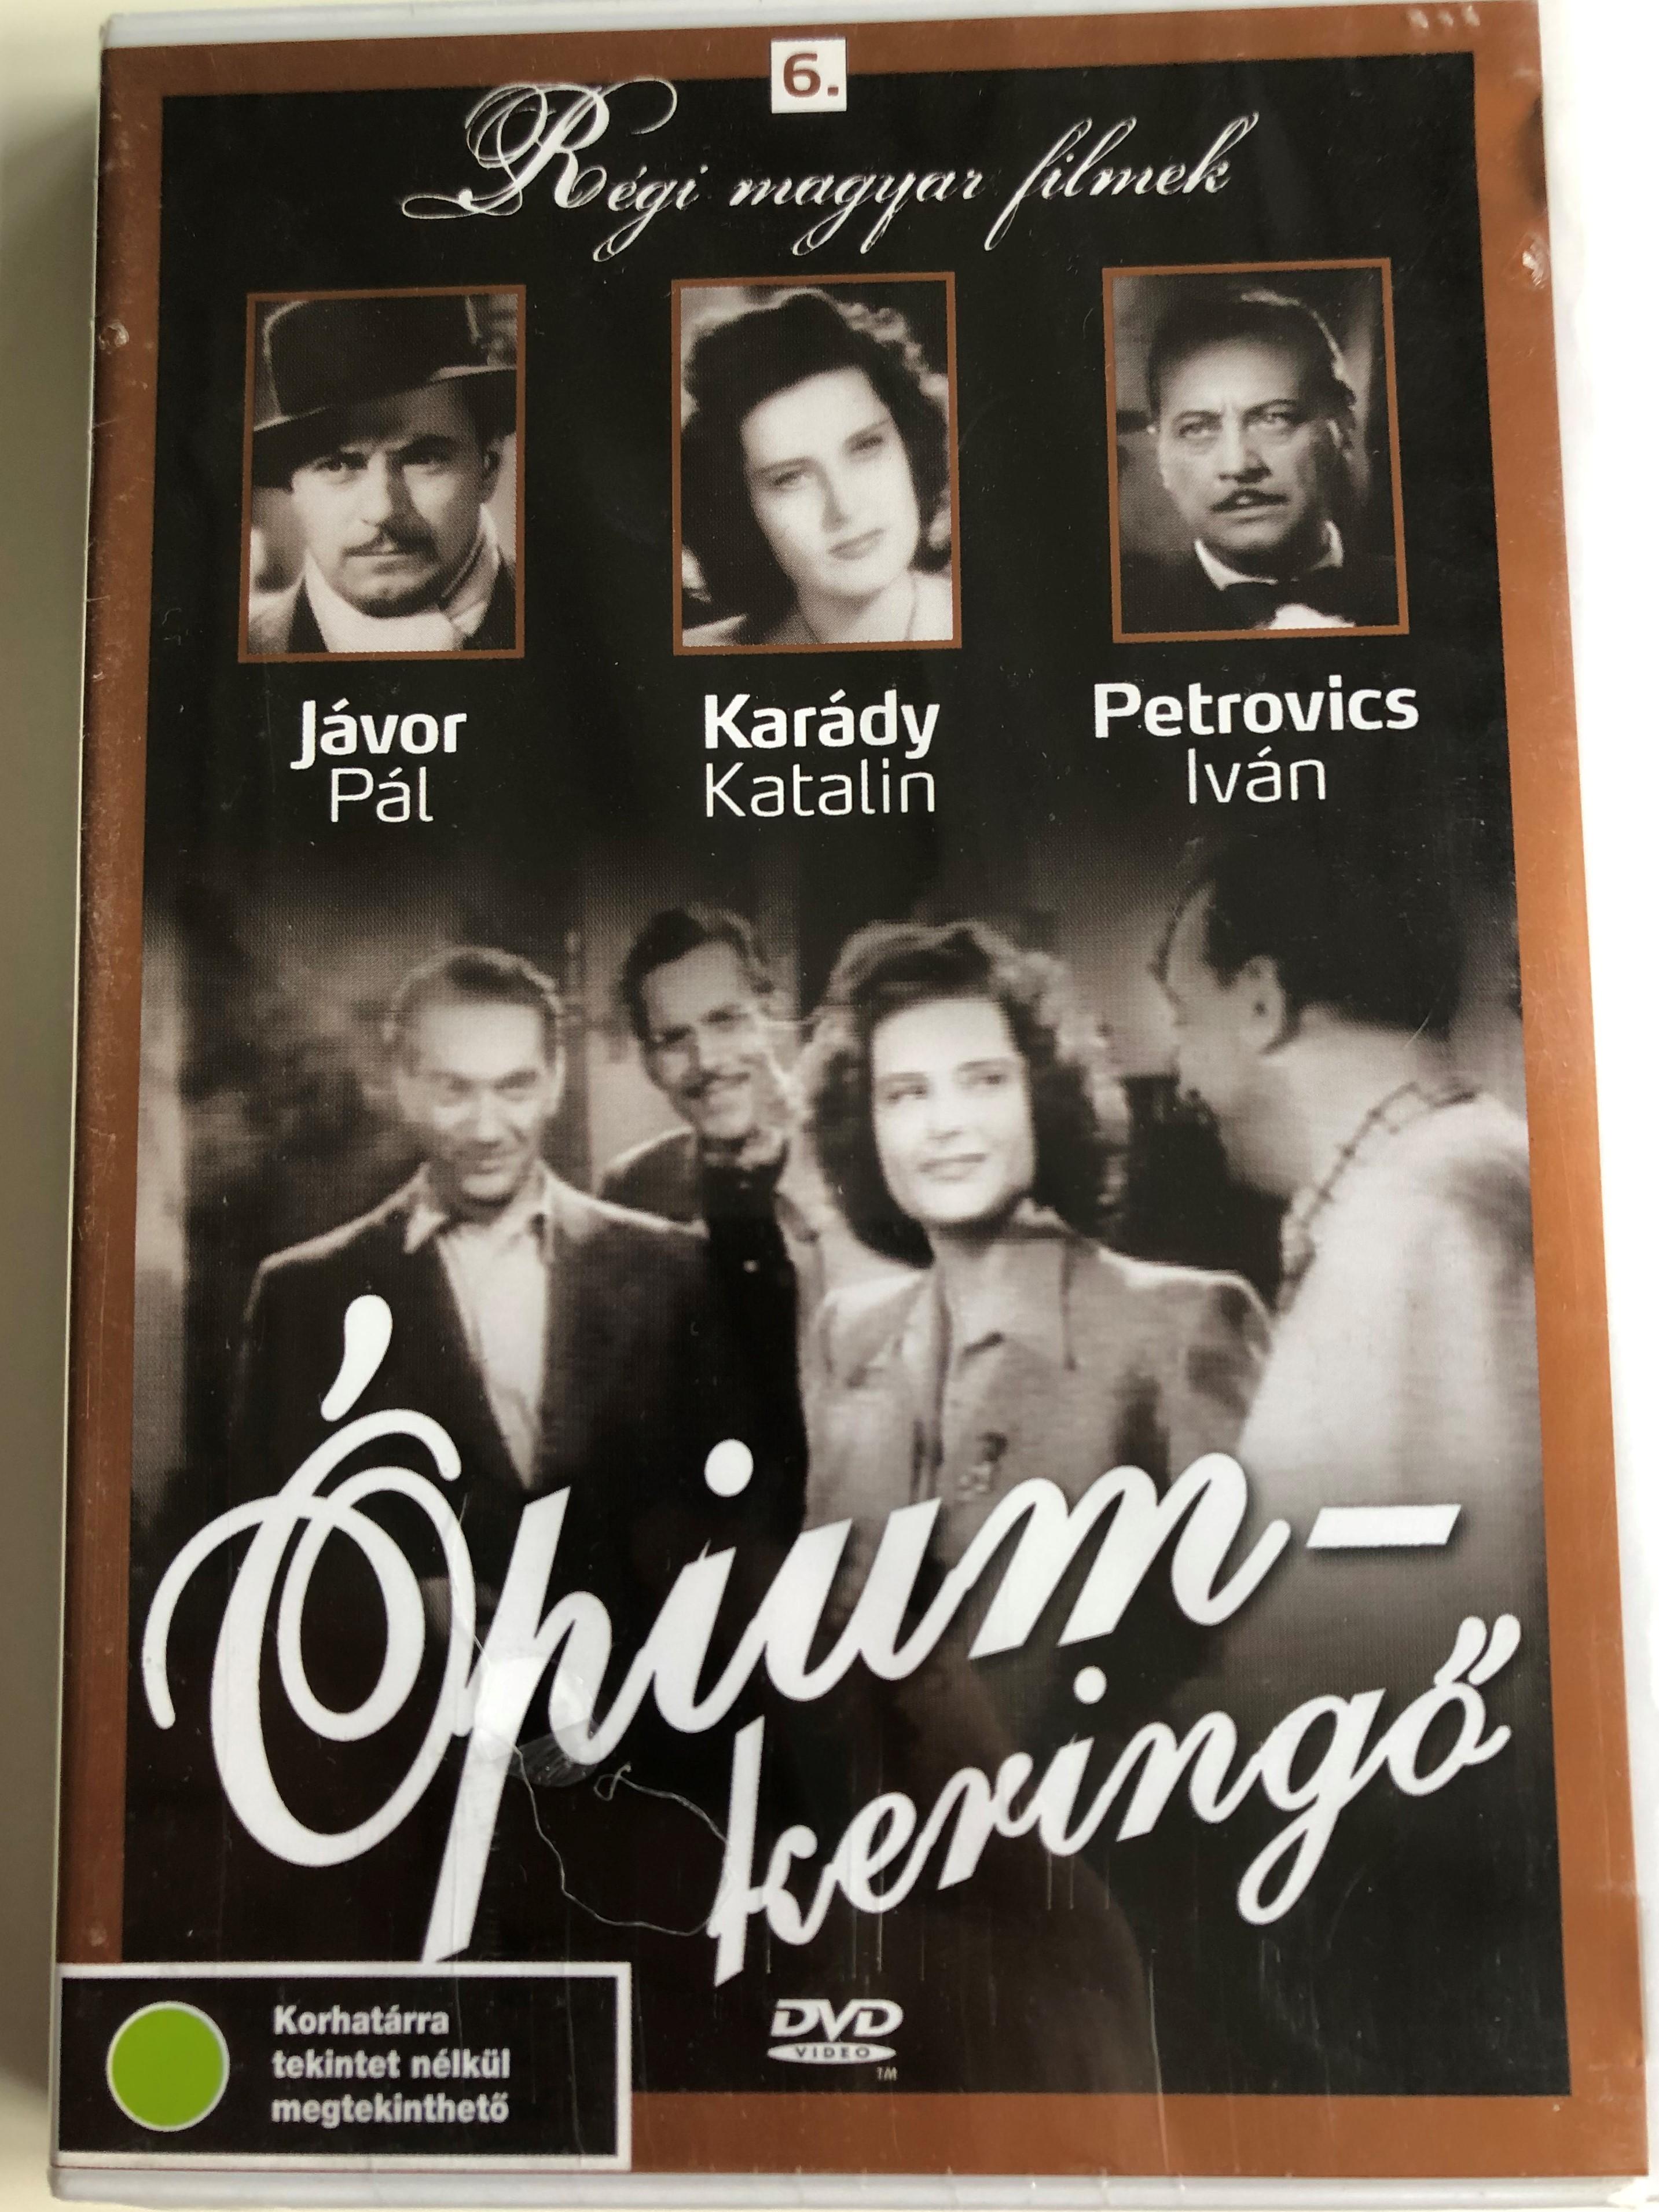 -piumkering-dvd-1943-opium-waltz-directed-by-balogh-b-la-starring-kar-dy-katalin-j-vorp-l-so-s-baksa-l-szl-tur-ni-c.-endre-r-gi-magyar-filmek-6.-b-w-hungarian-classic-1-.jpg